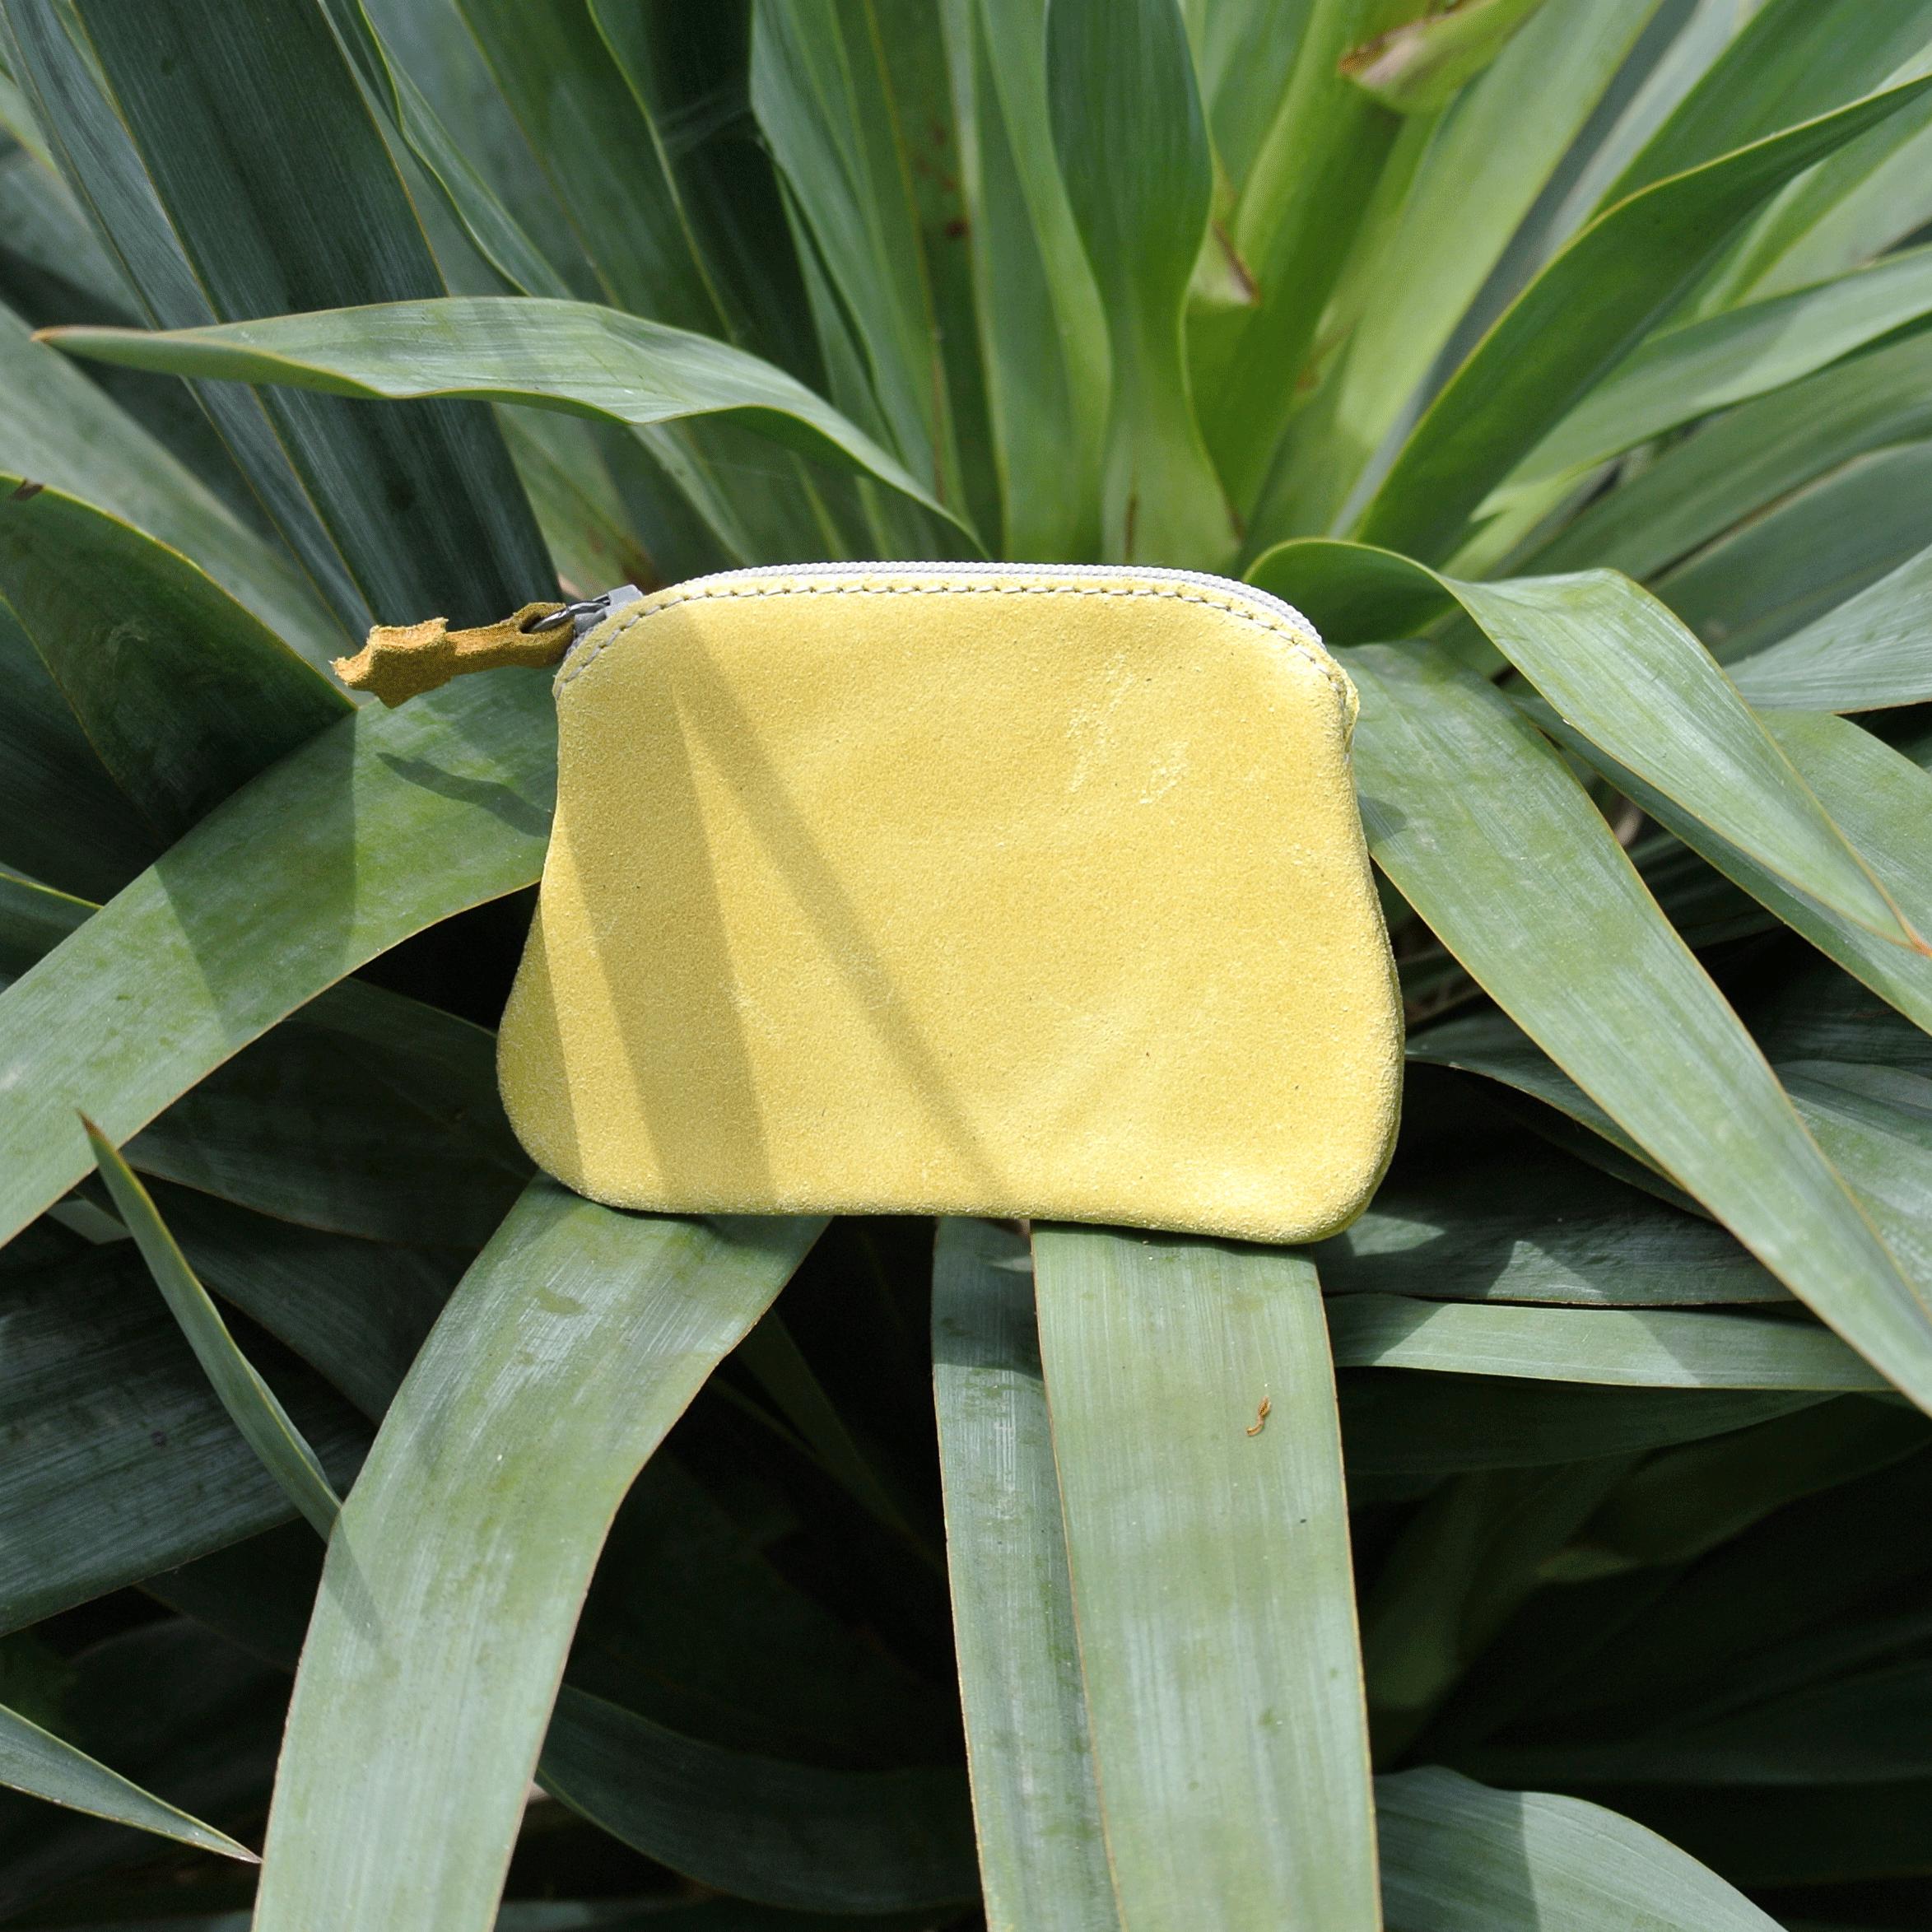 cuirs-fantaisies-la-cartabliere-fabrique-en-france-porte-monnaie-kiwi-en-cuir-retro-jaune-safran